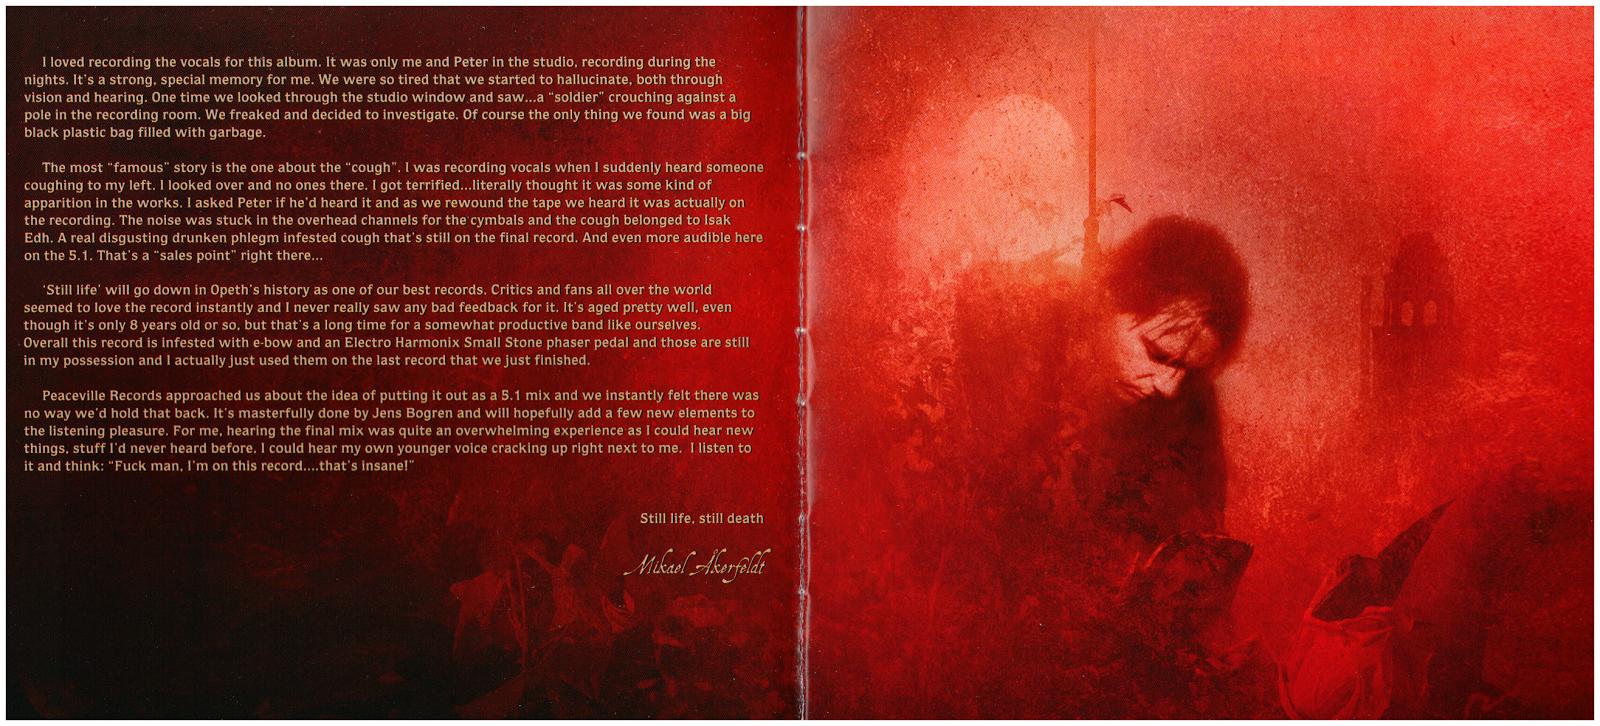 Opeth Album By Album Review Still Life 1999 Randy Rhoads Archive